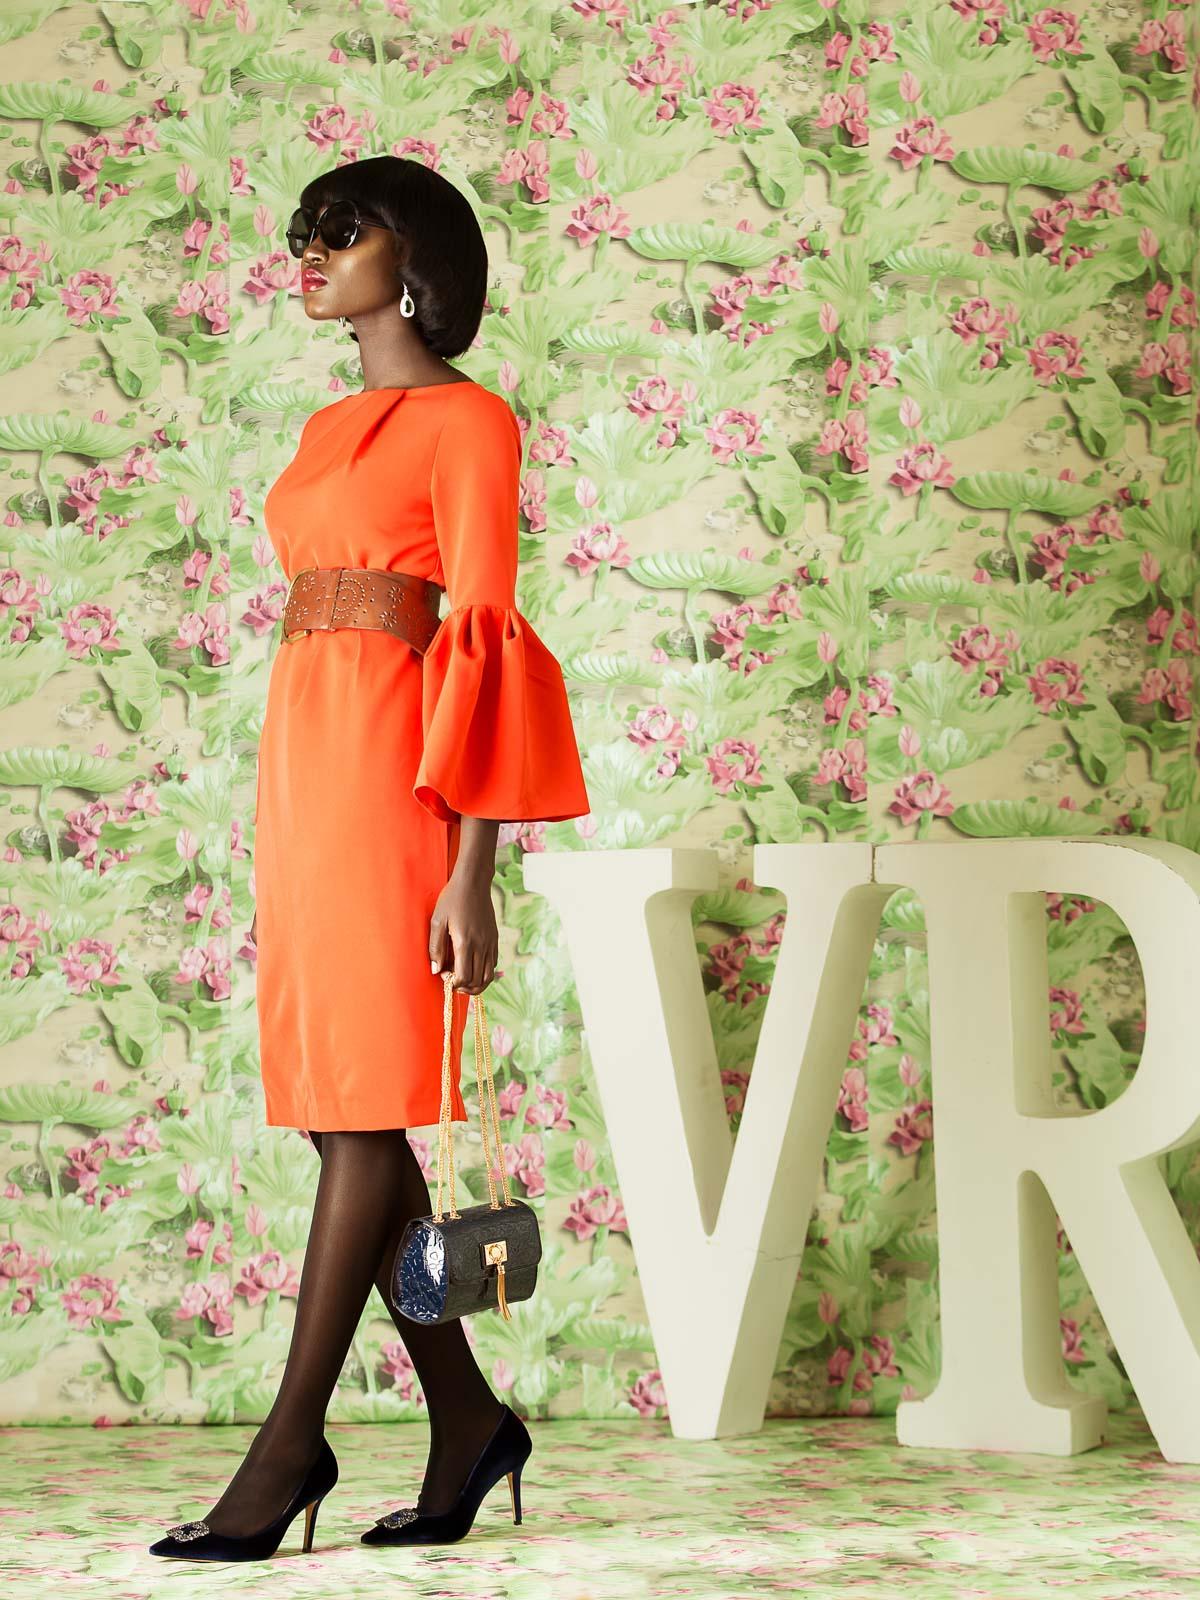 VR by MOBOS | 2017 Fashion Week Edit